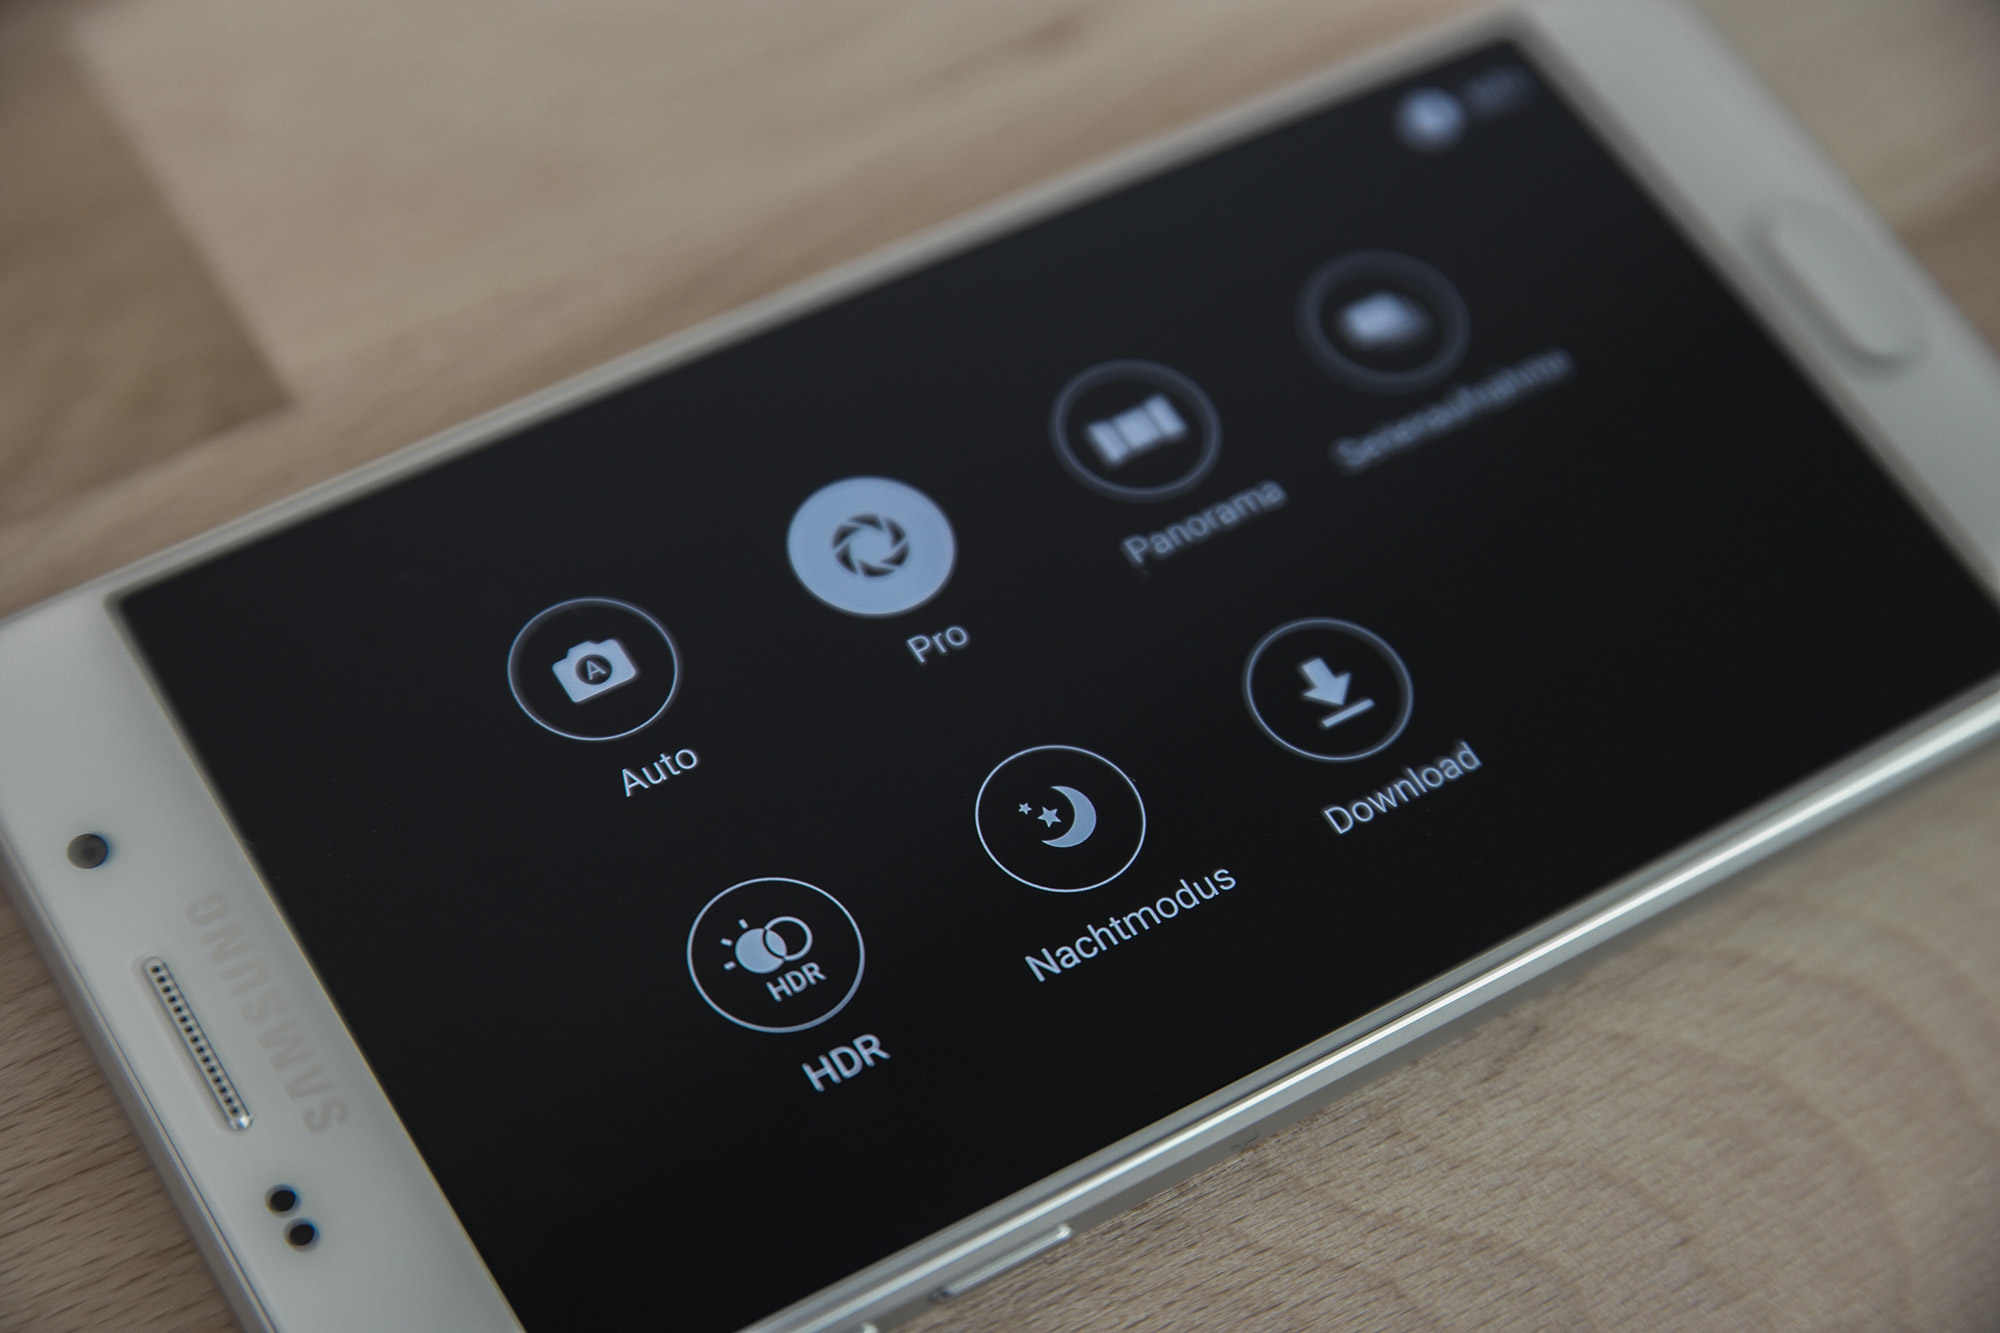 Samsung Galaxy A5 2016 Testbericht